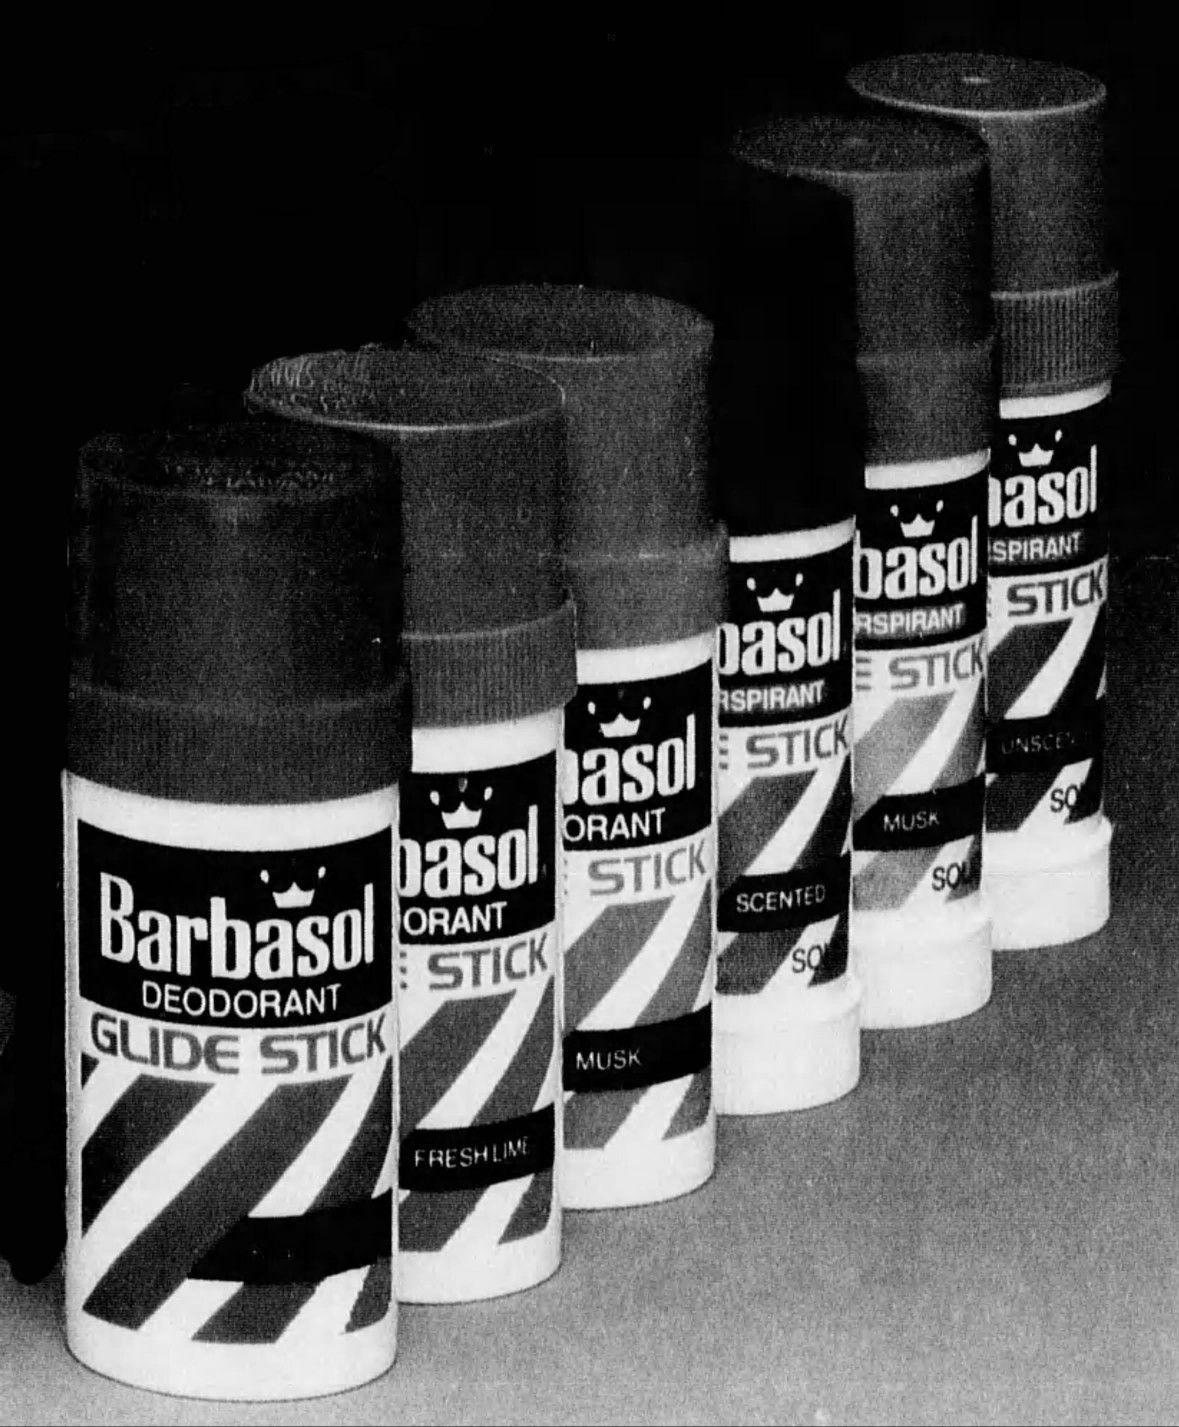 Barbasol Glide Stick Deodorants (1984-88) | The Johnsons